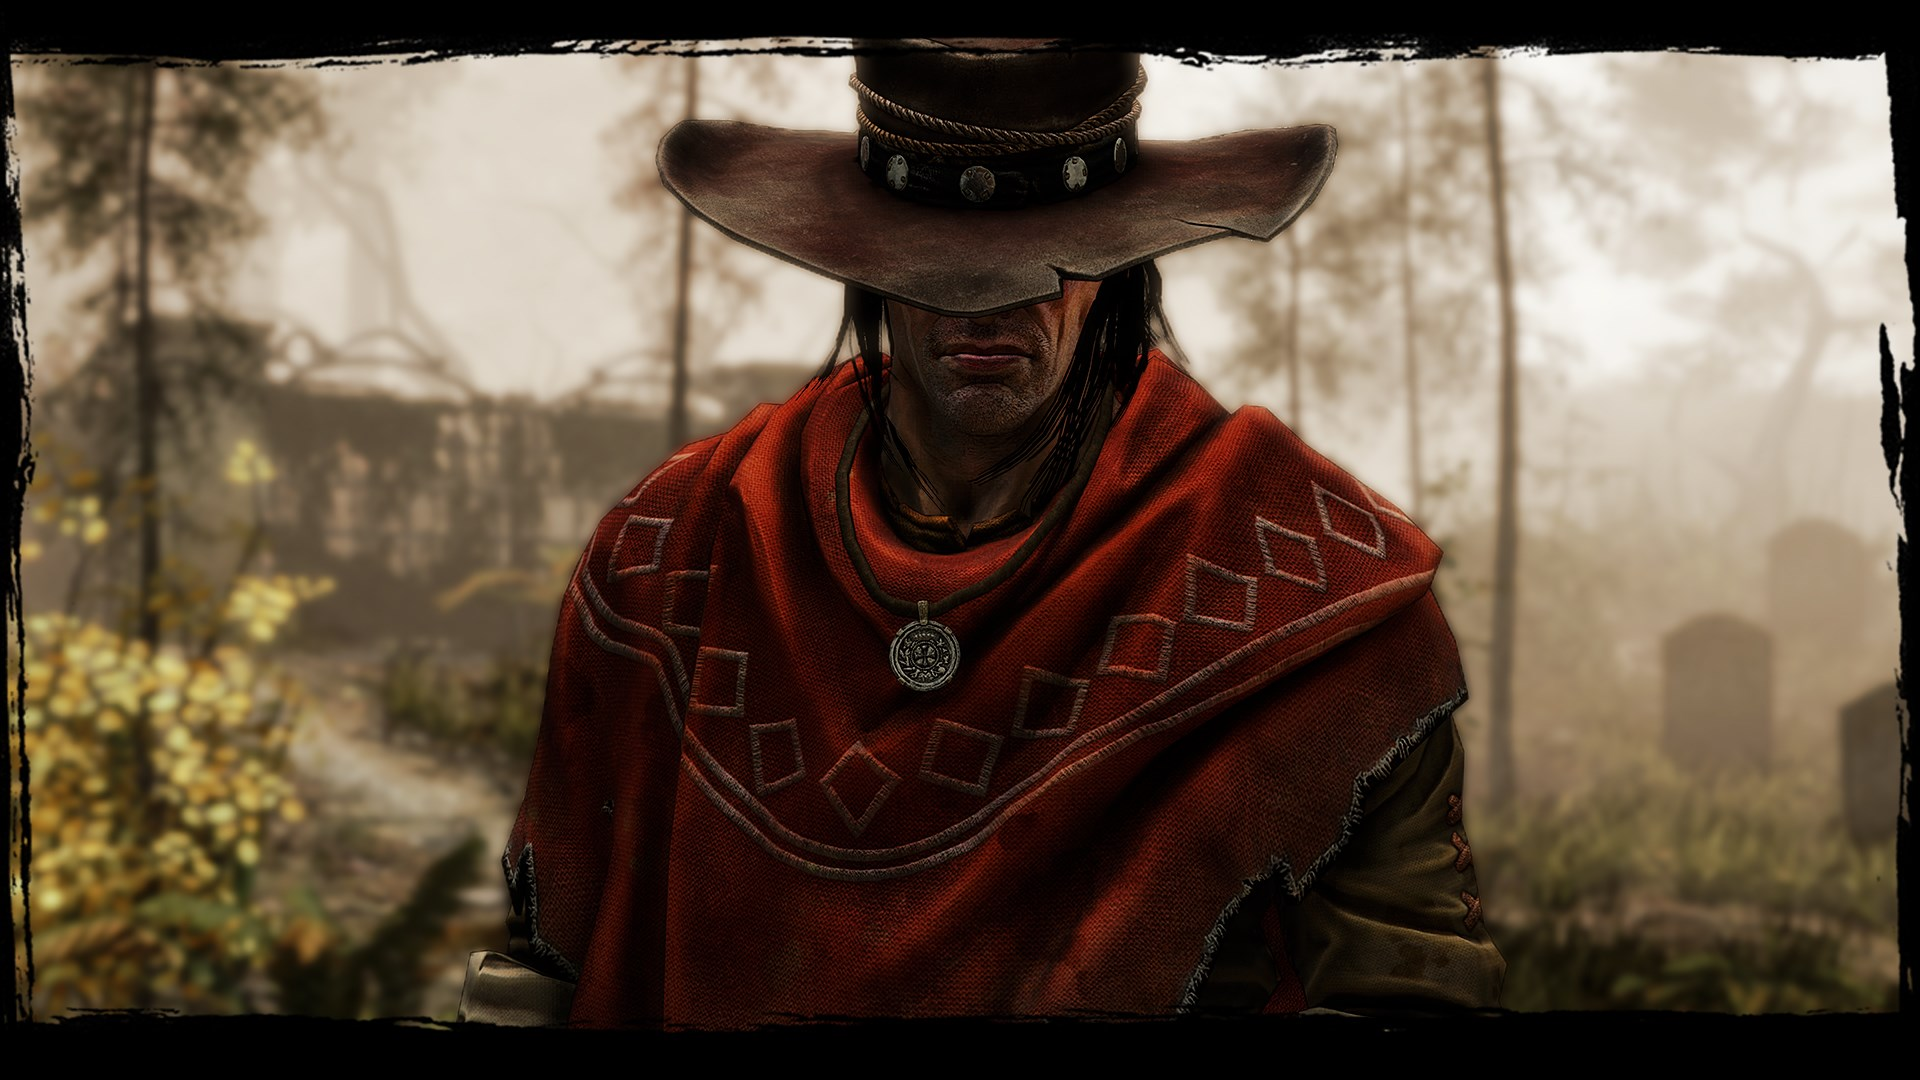 The best western games that aren't Red Dead Redemption 2